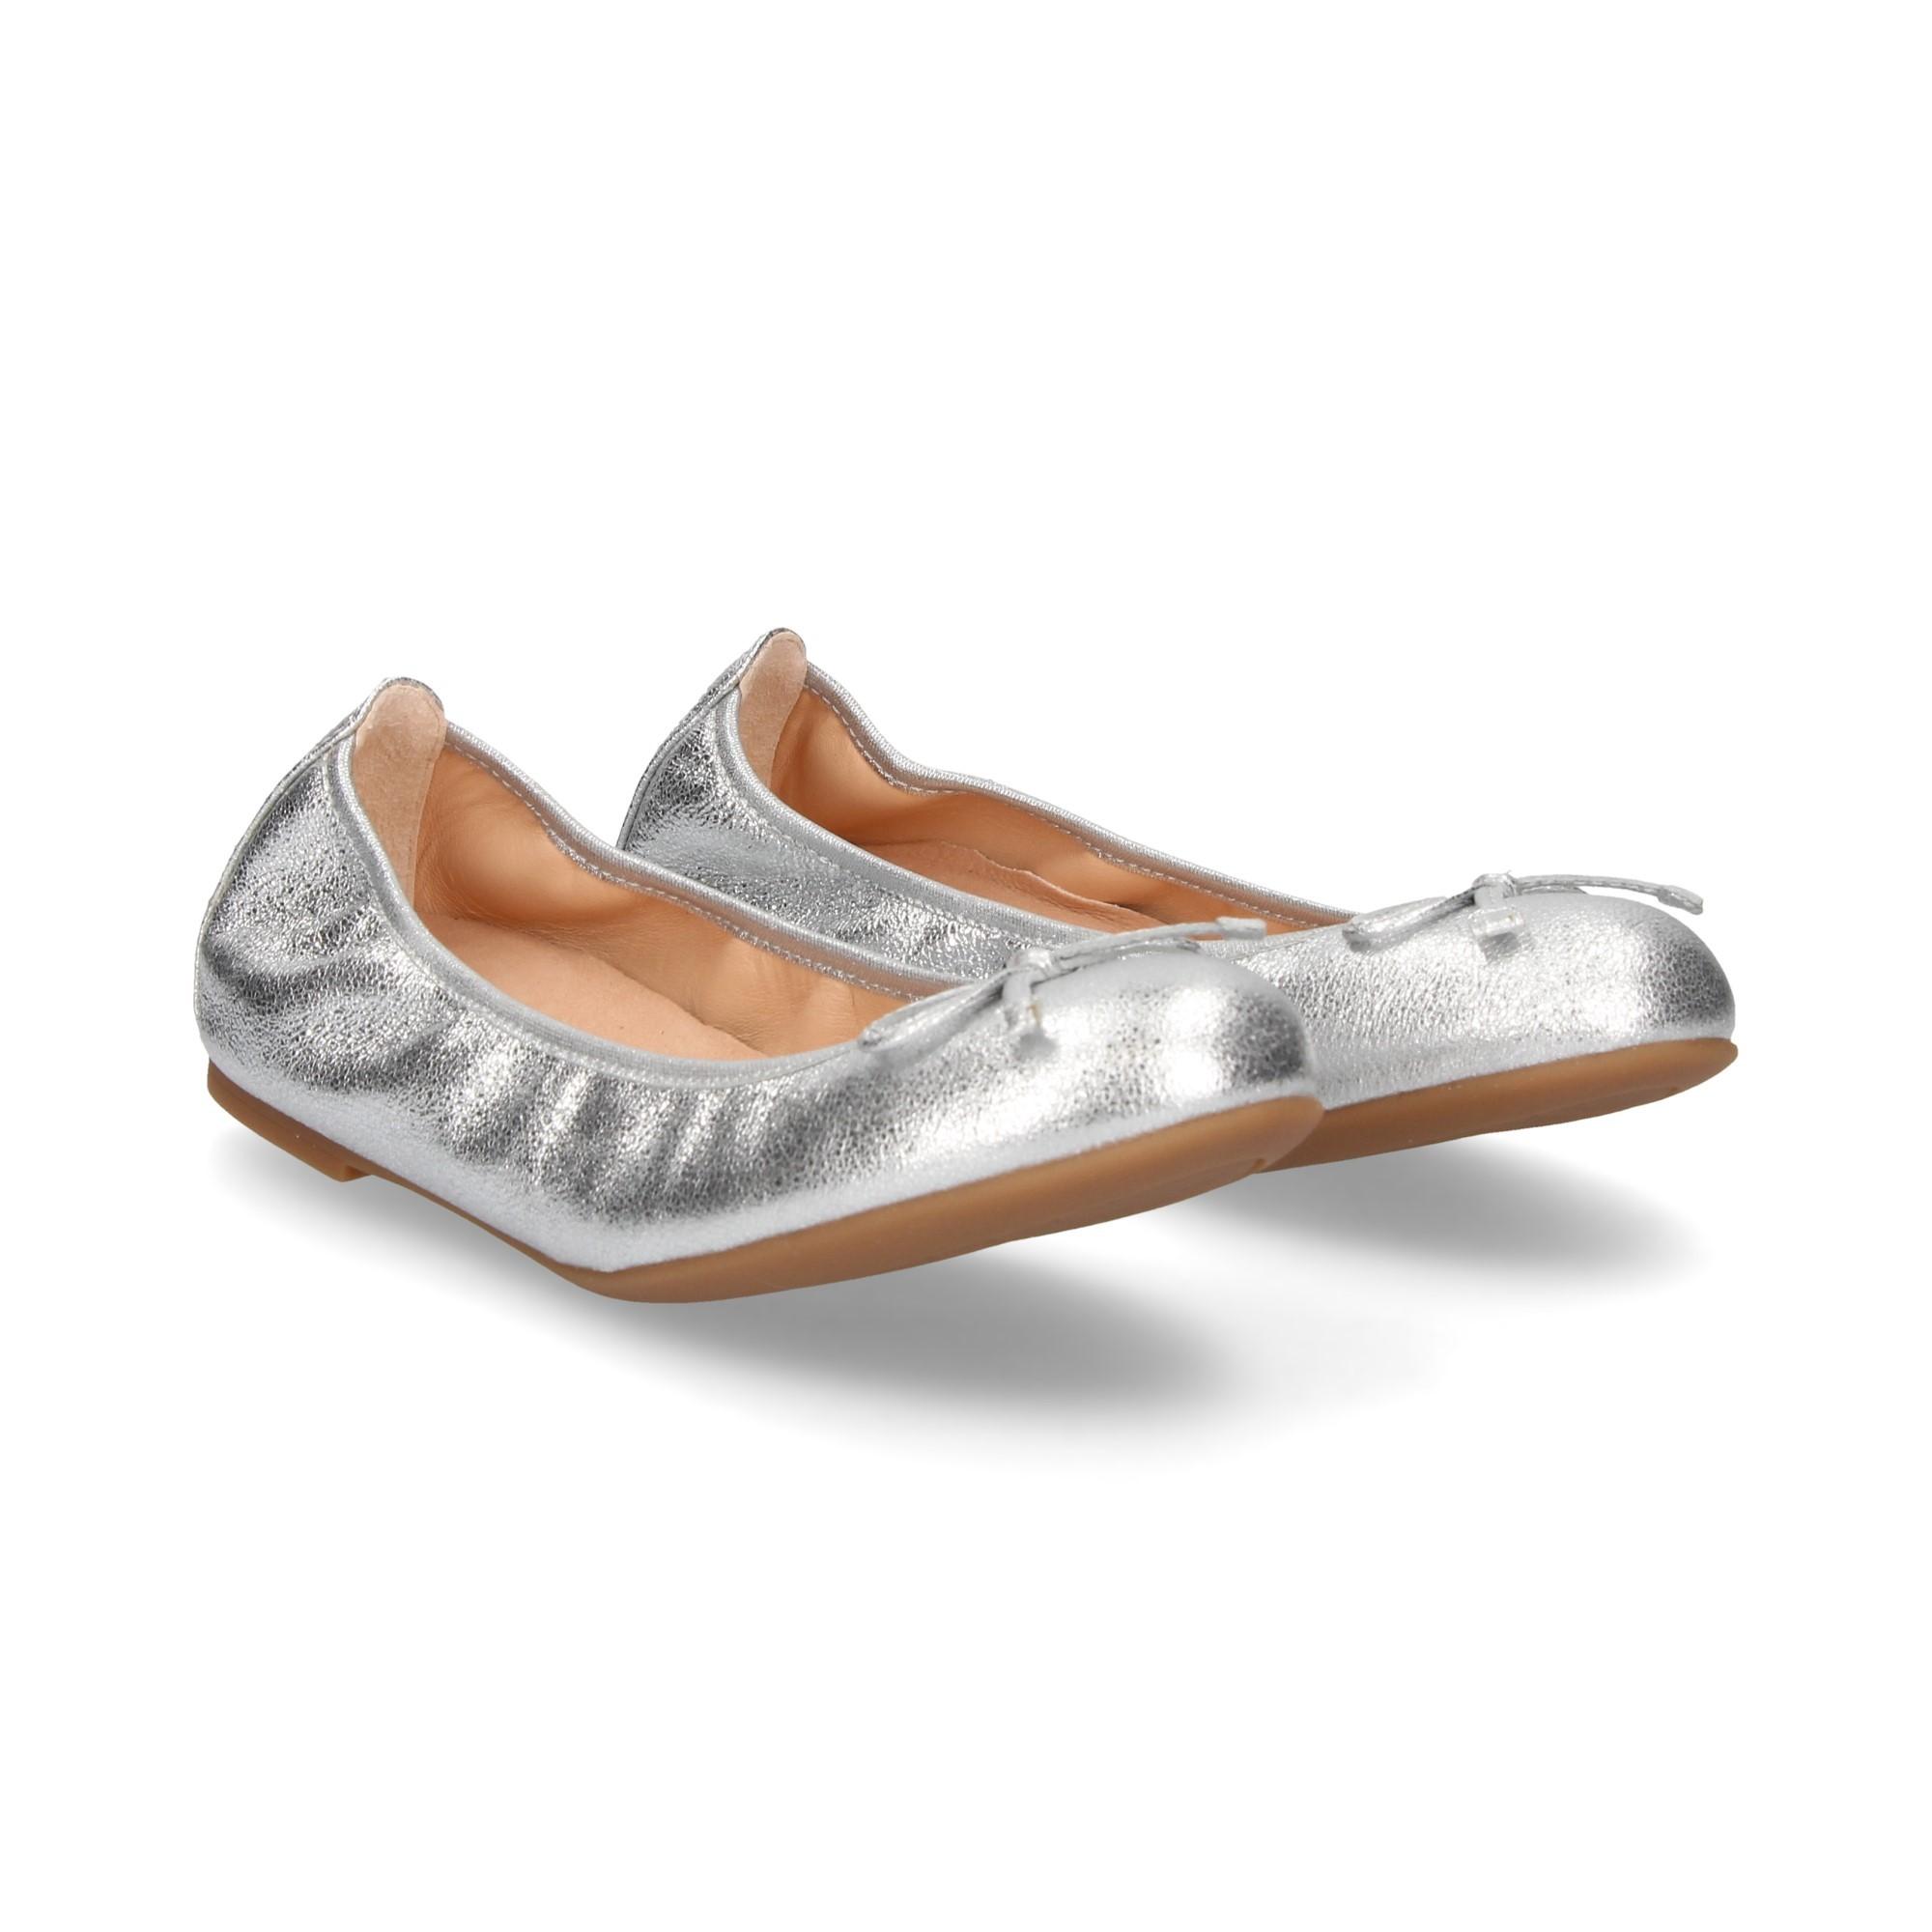 bailarina-lazo-craquelado-plata